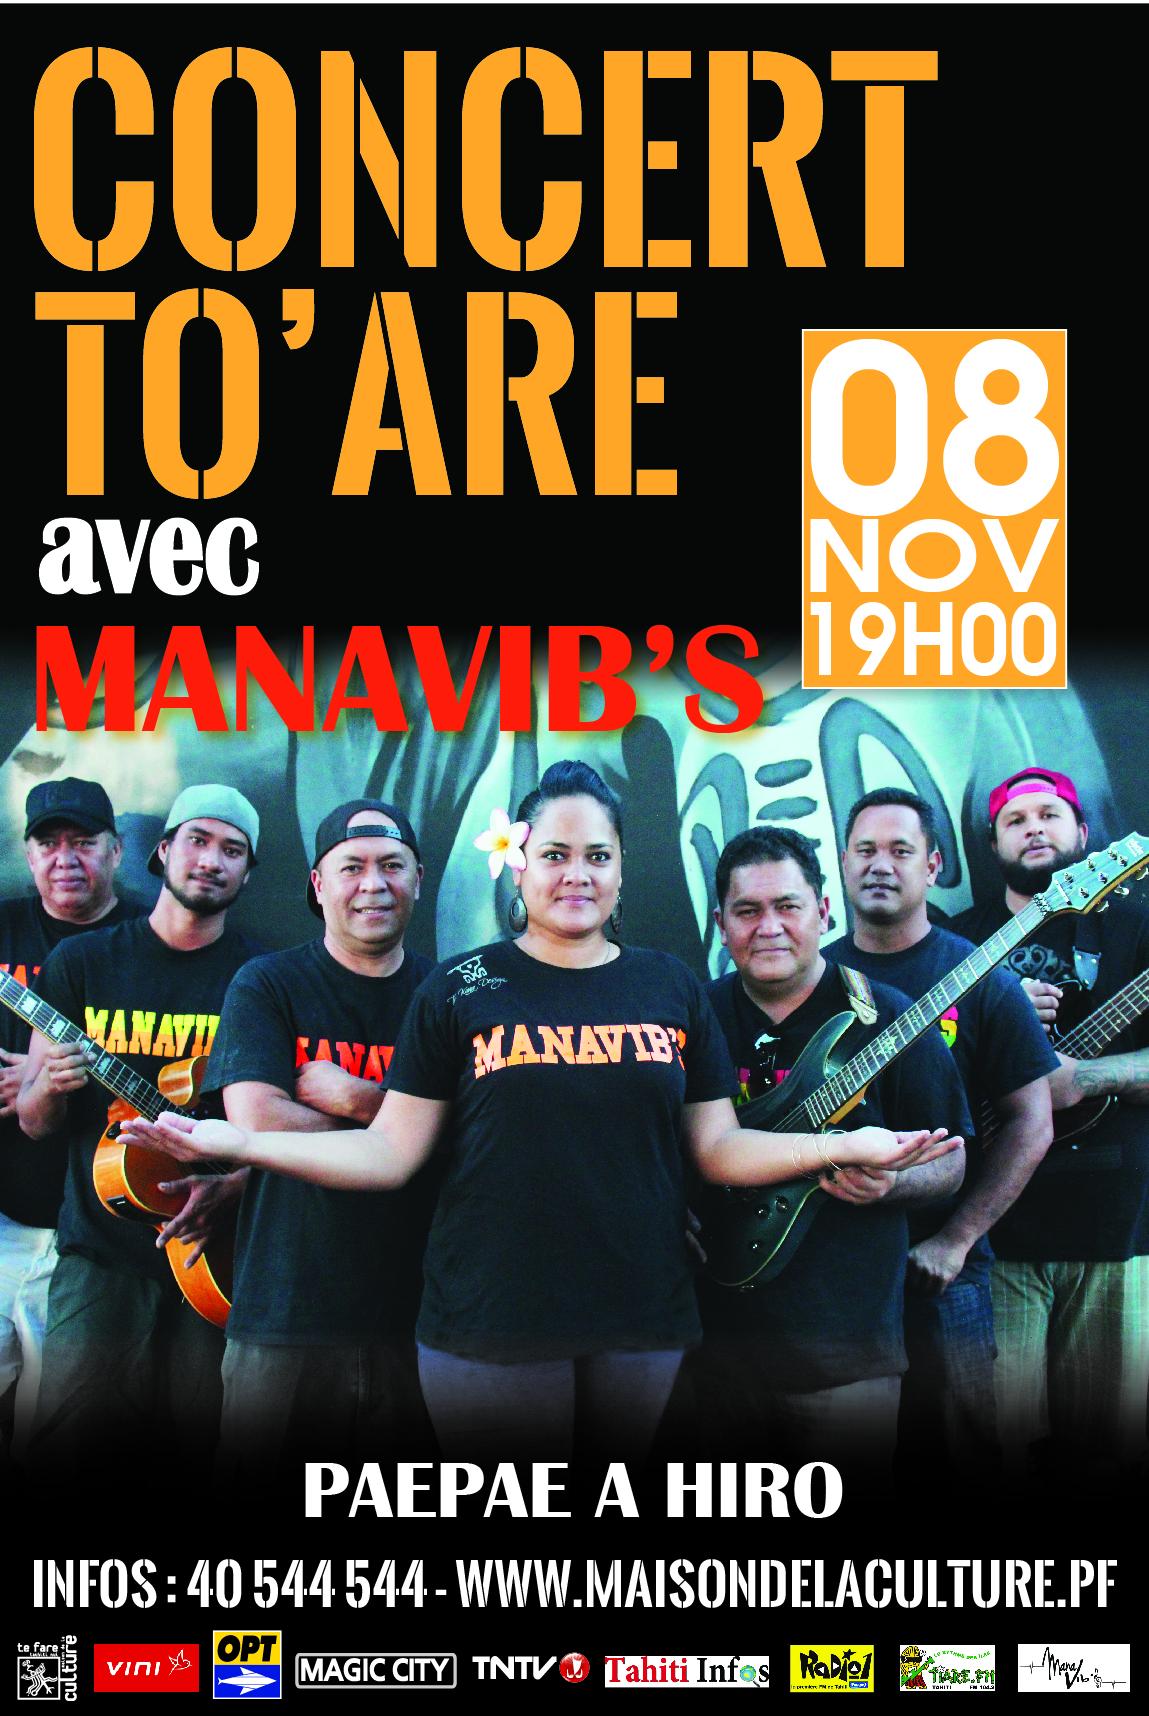 Affiche concert toare Manavibs-jaune